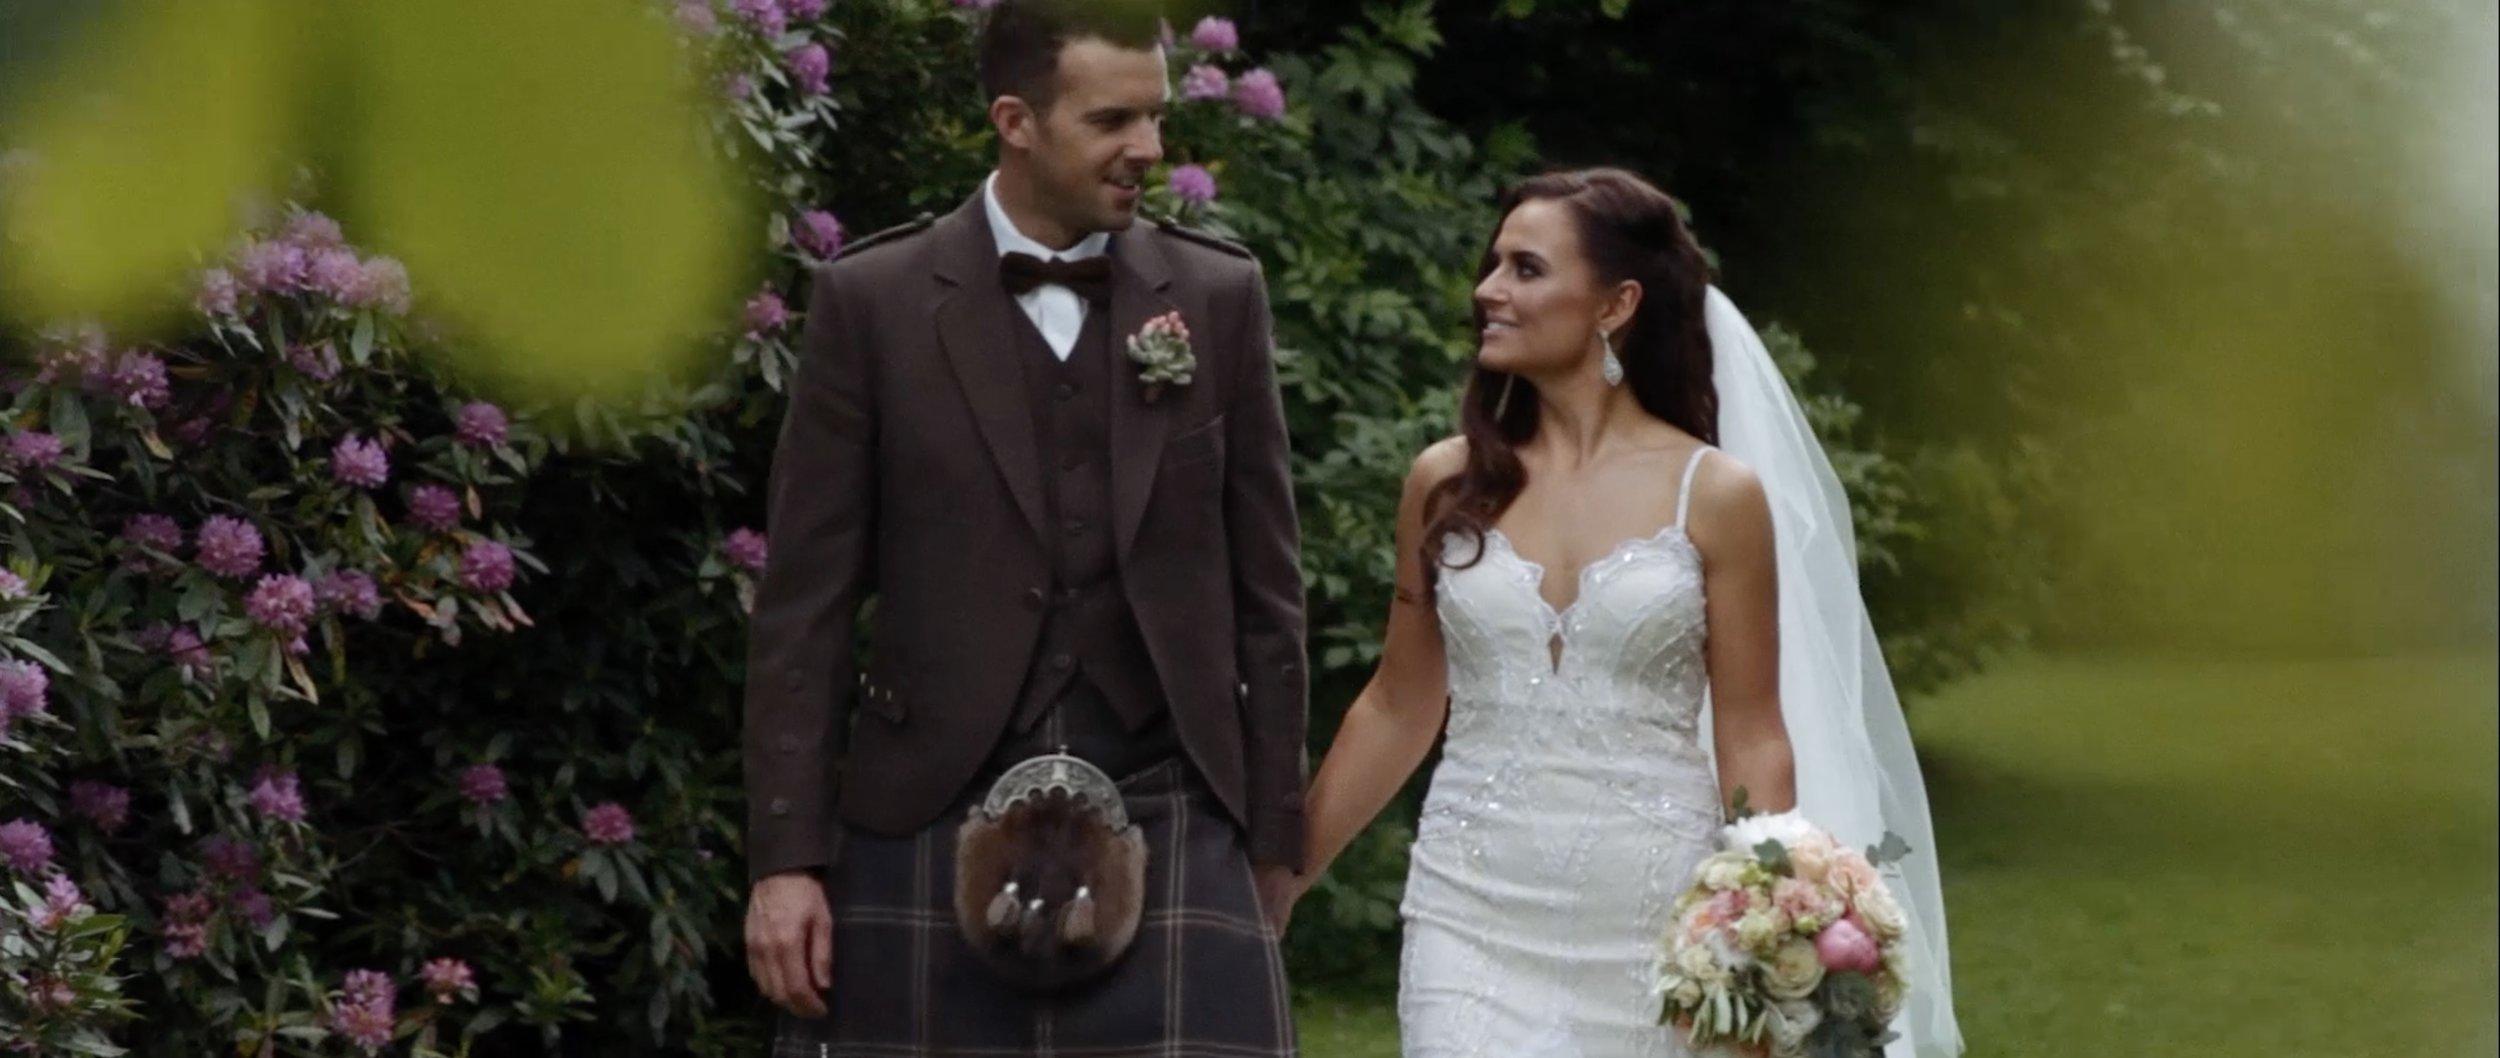 the-engine-works-wedding-videographer_LL_06.jpg